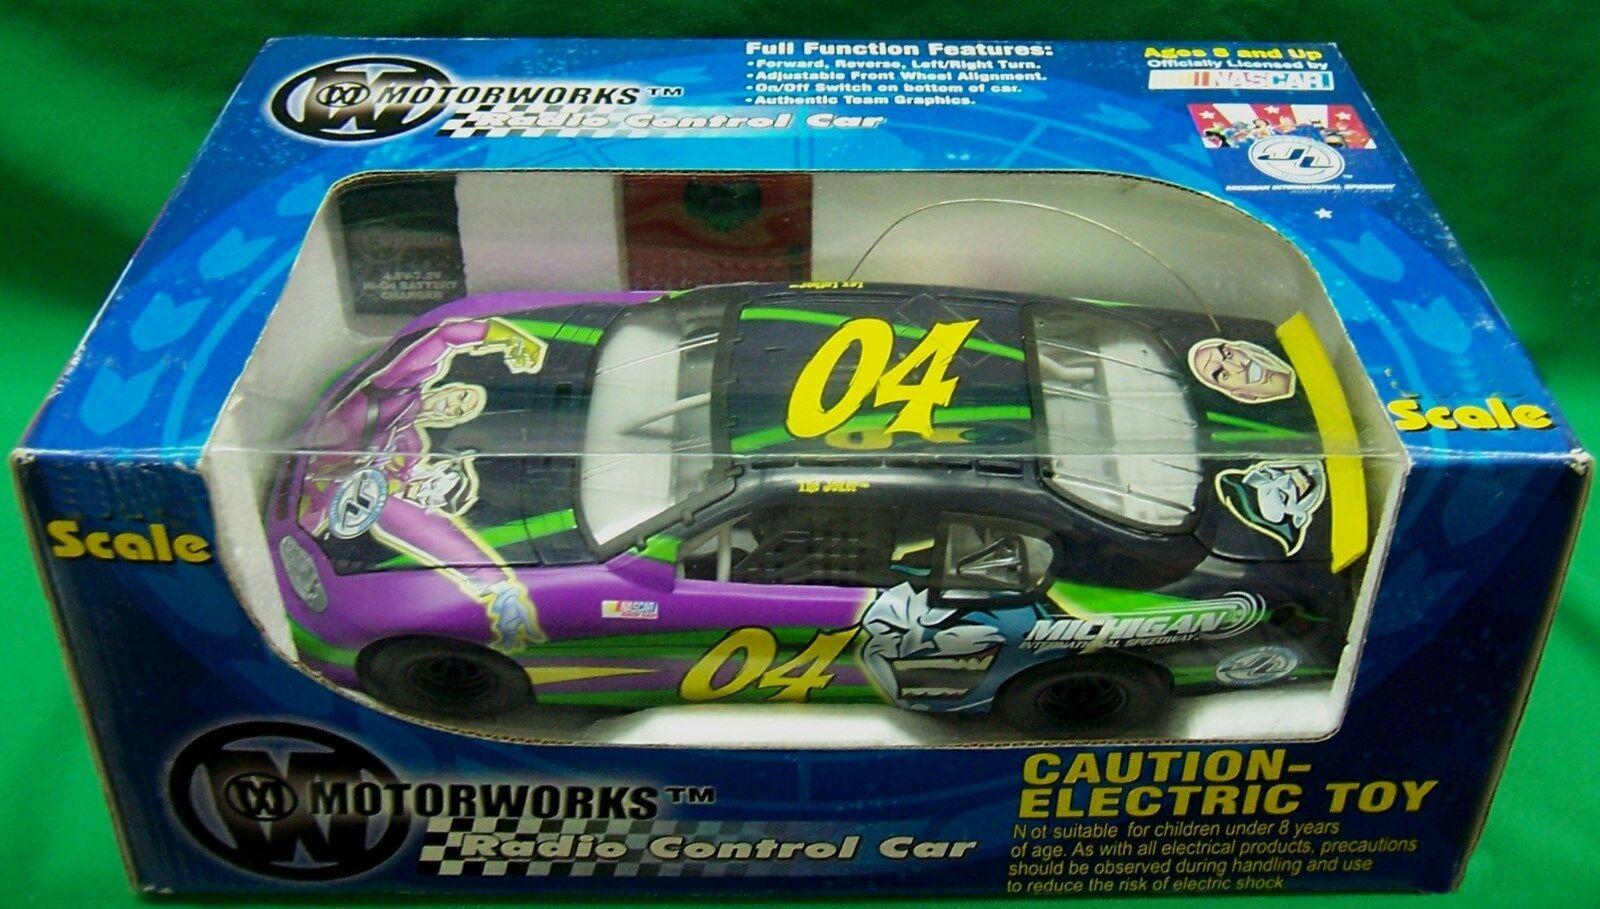 JUSTICE LEAGUE MOTORWORKS RADIO CONTROL CAR R C 1 32 SCALE THE JOKER NASCAR